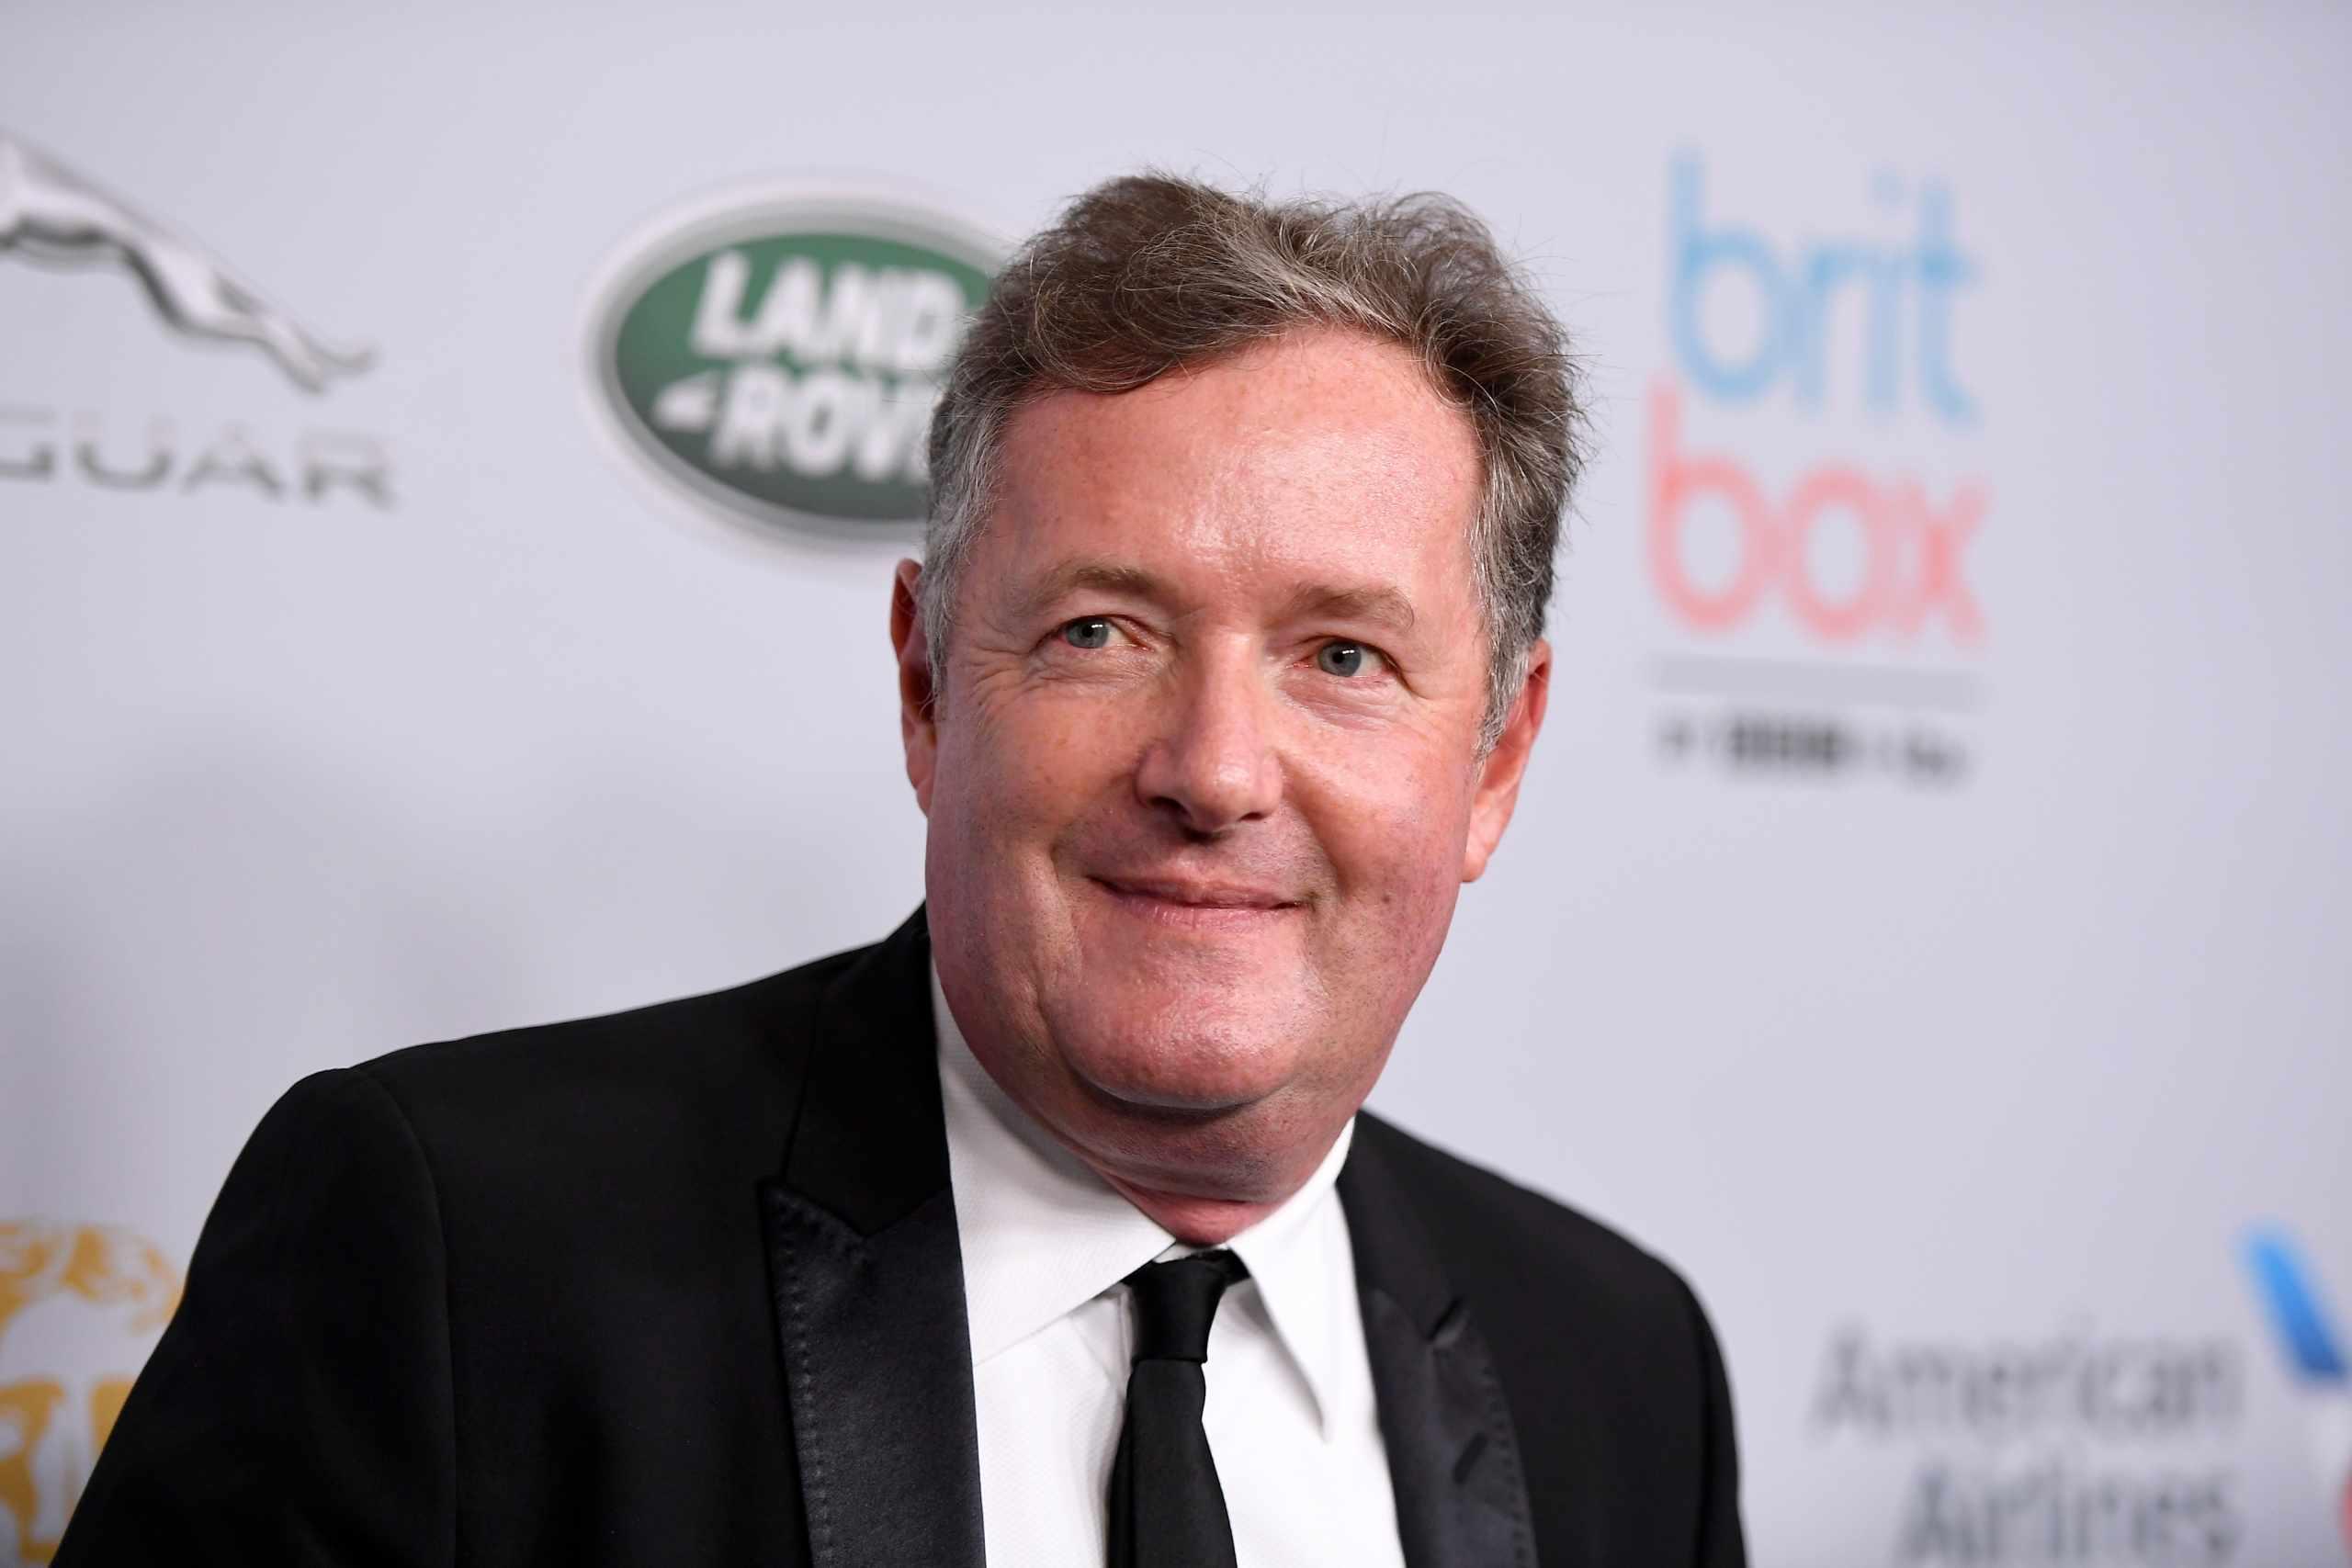 Piers Morgan left GMTV